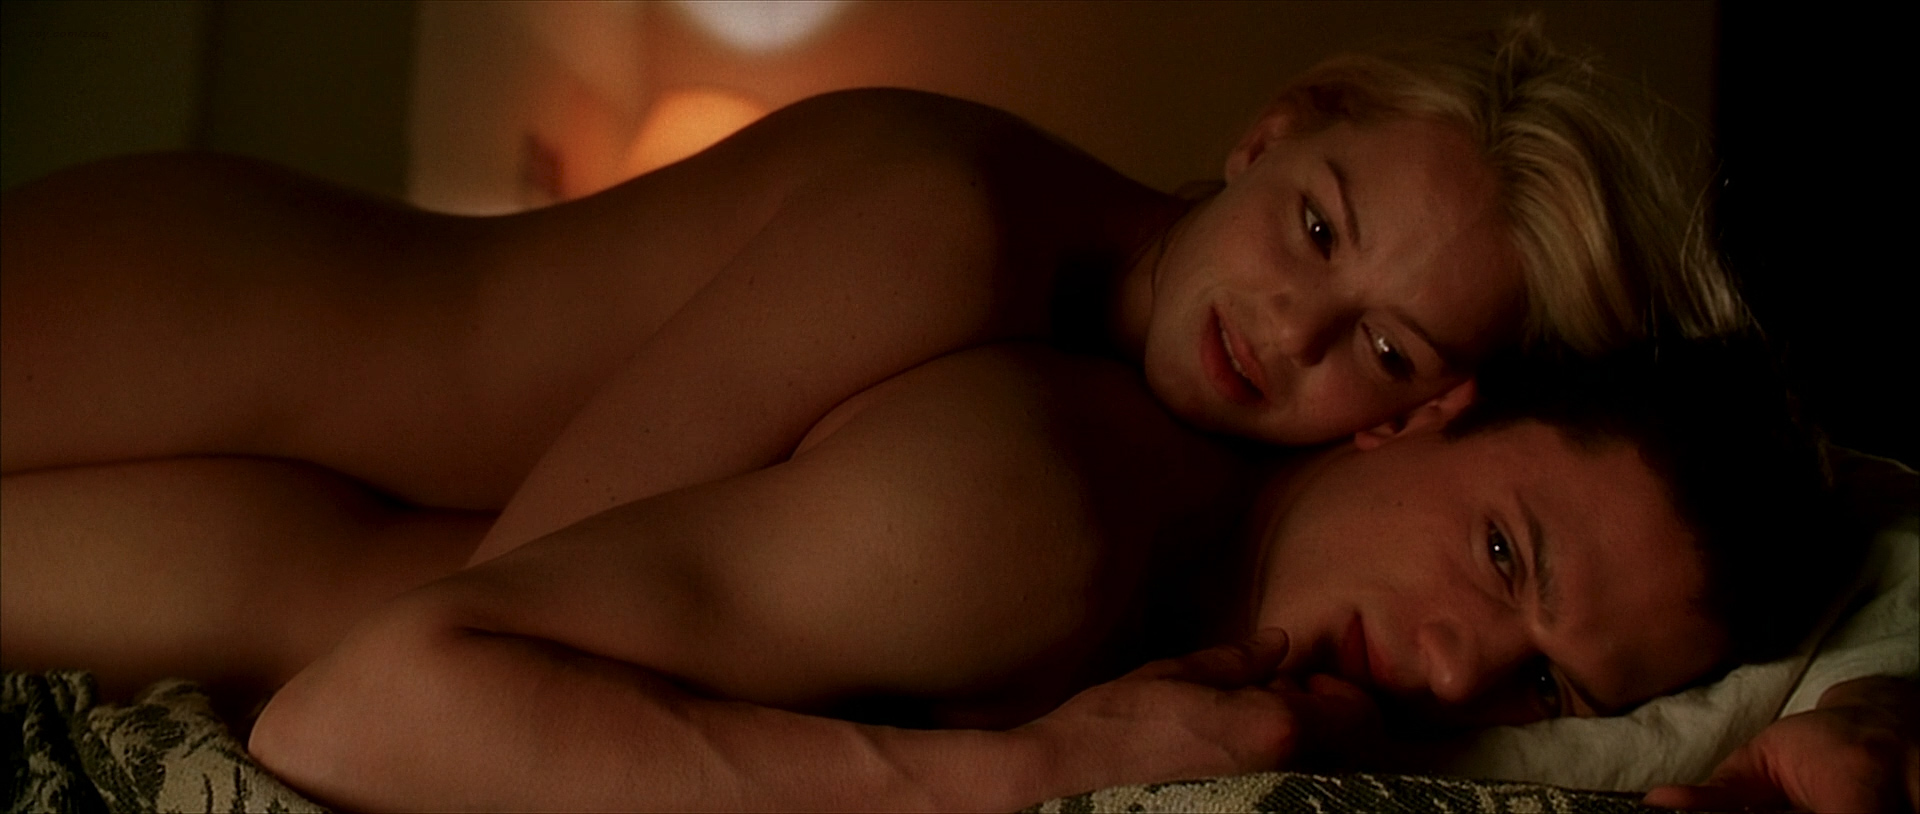 Nicole Kidman sexy hot and Jacinda Barrett nude bush and boobs- The Human Stain (2003) HD 1080p BluRay (11)